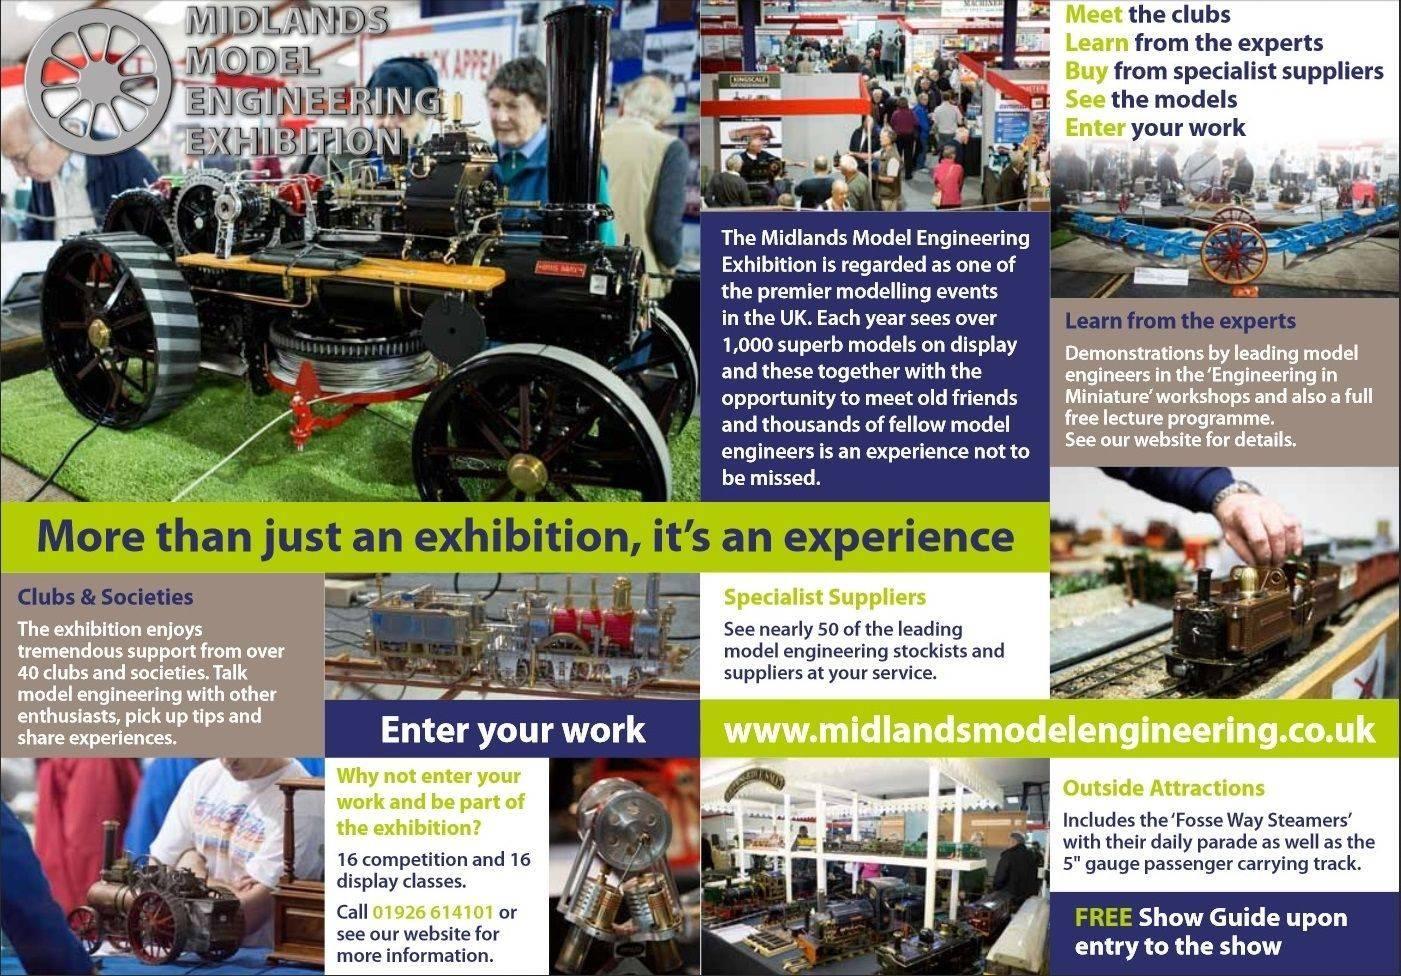 Midlands Model Engineering Exhibition Leaflet.jpg